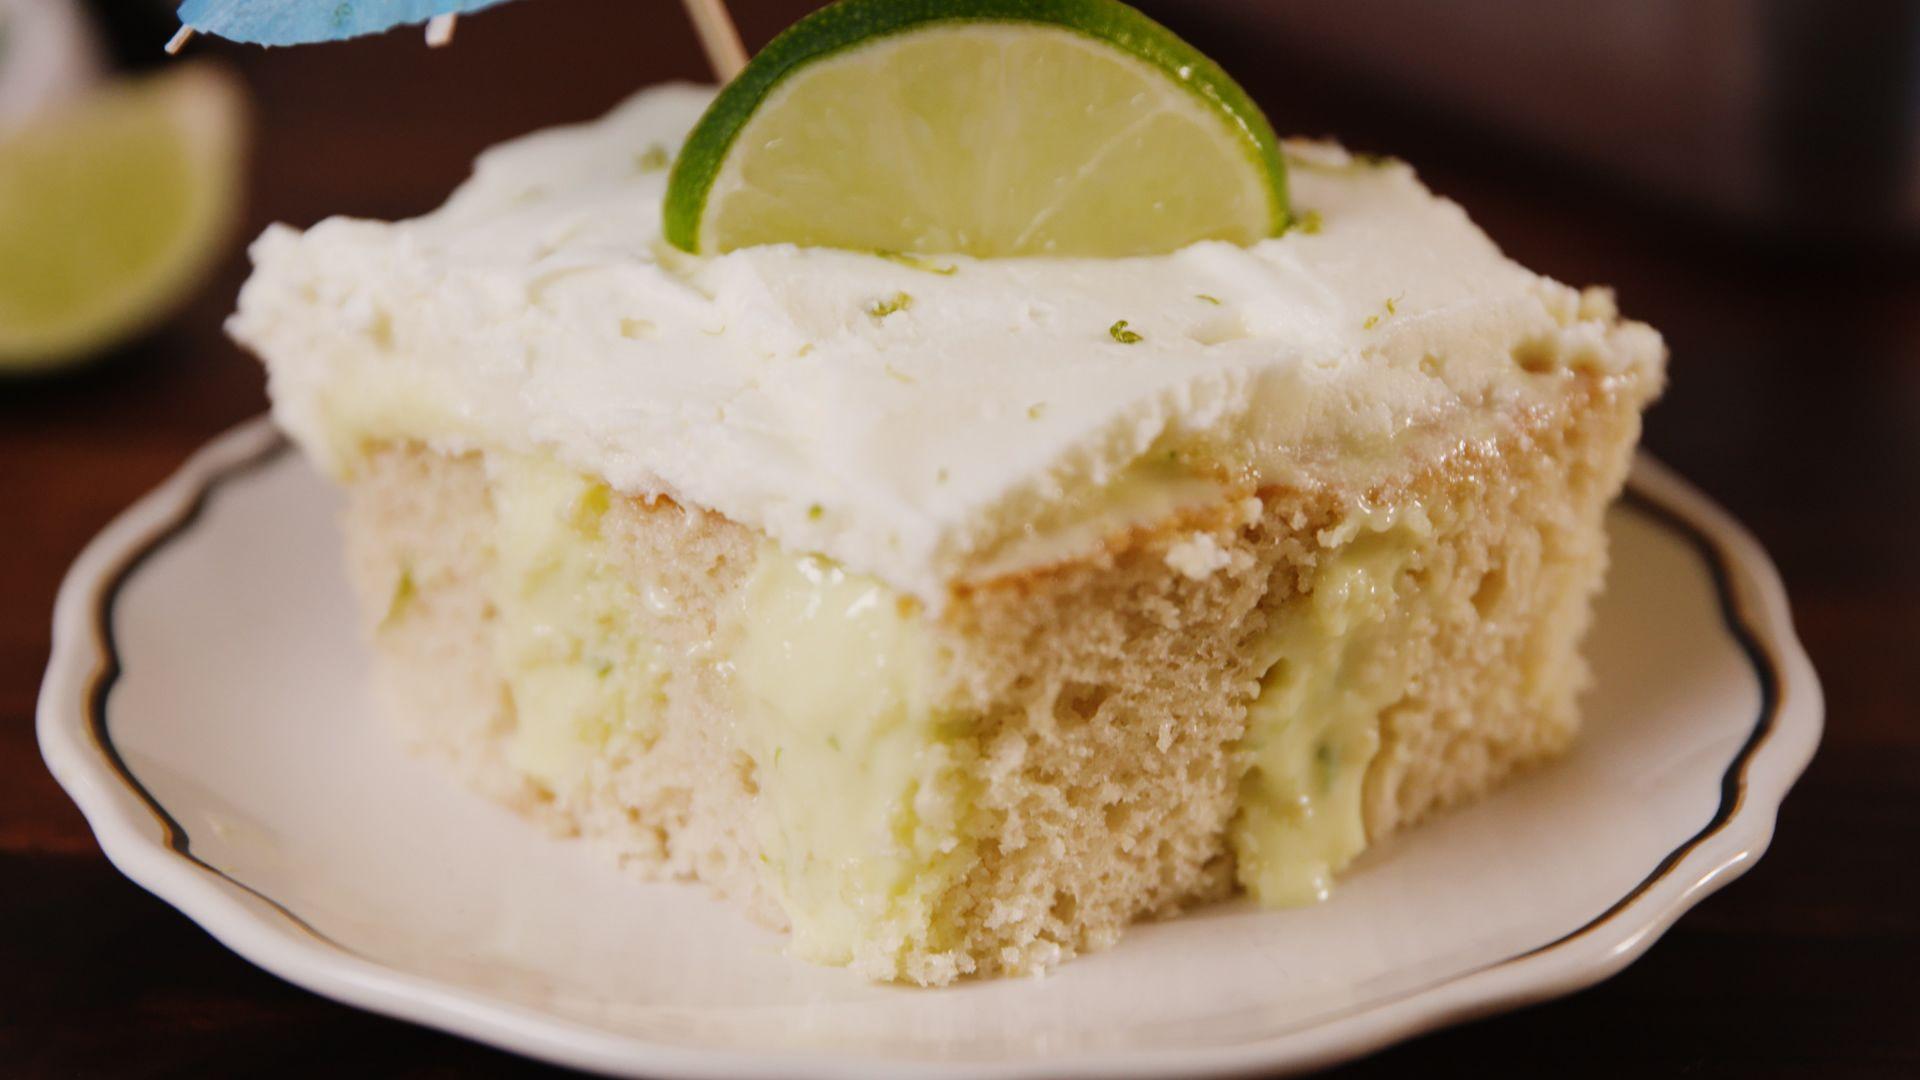 Best Margarita Poke Cake Recipe How To Make Margarita Poke Cake